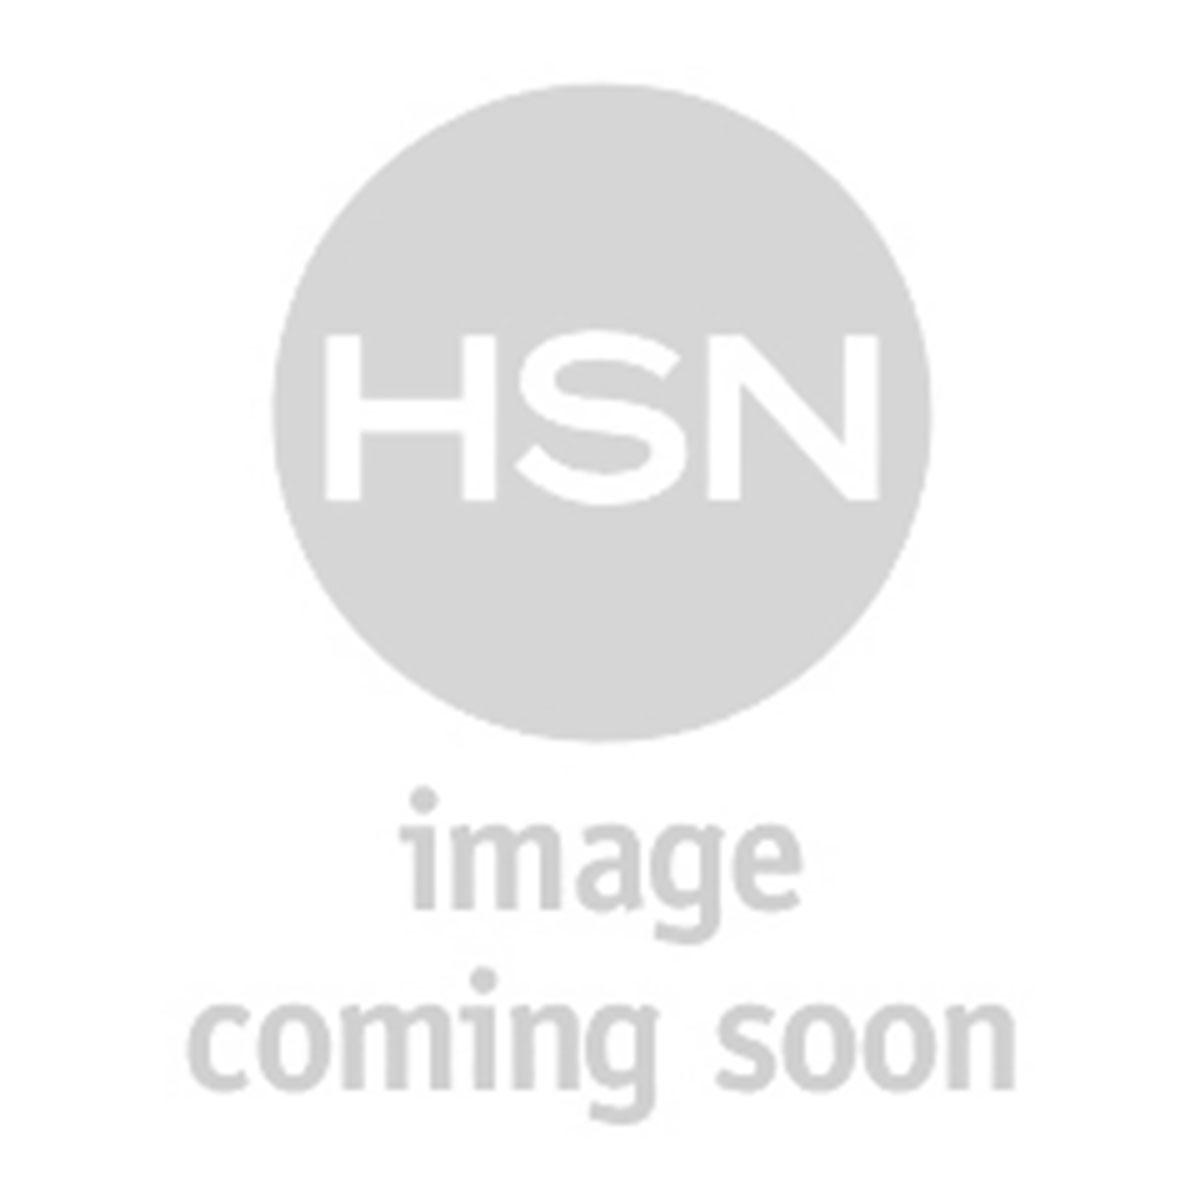 upholstery supplies sss enterprises